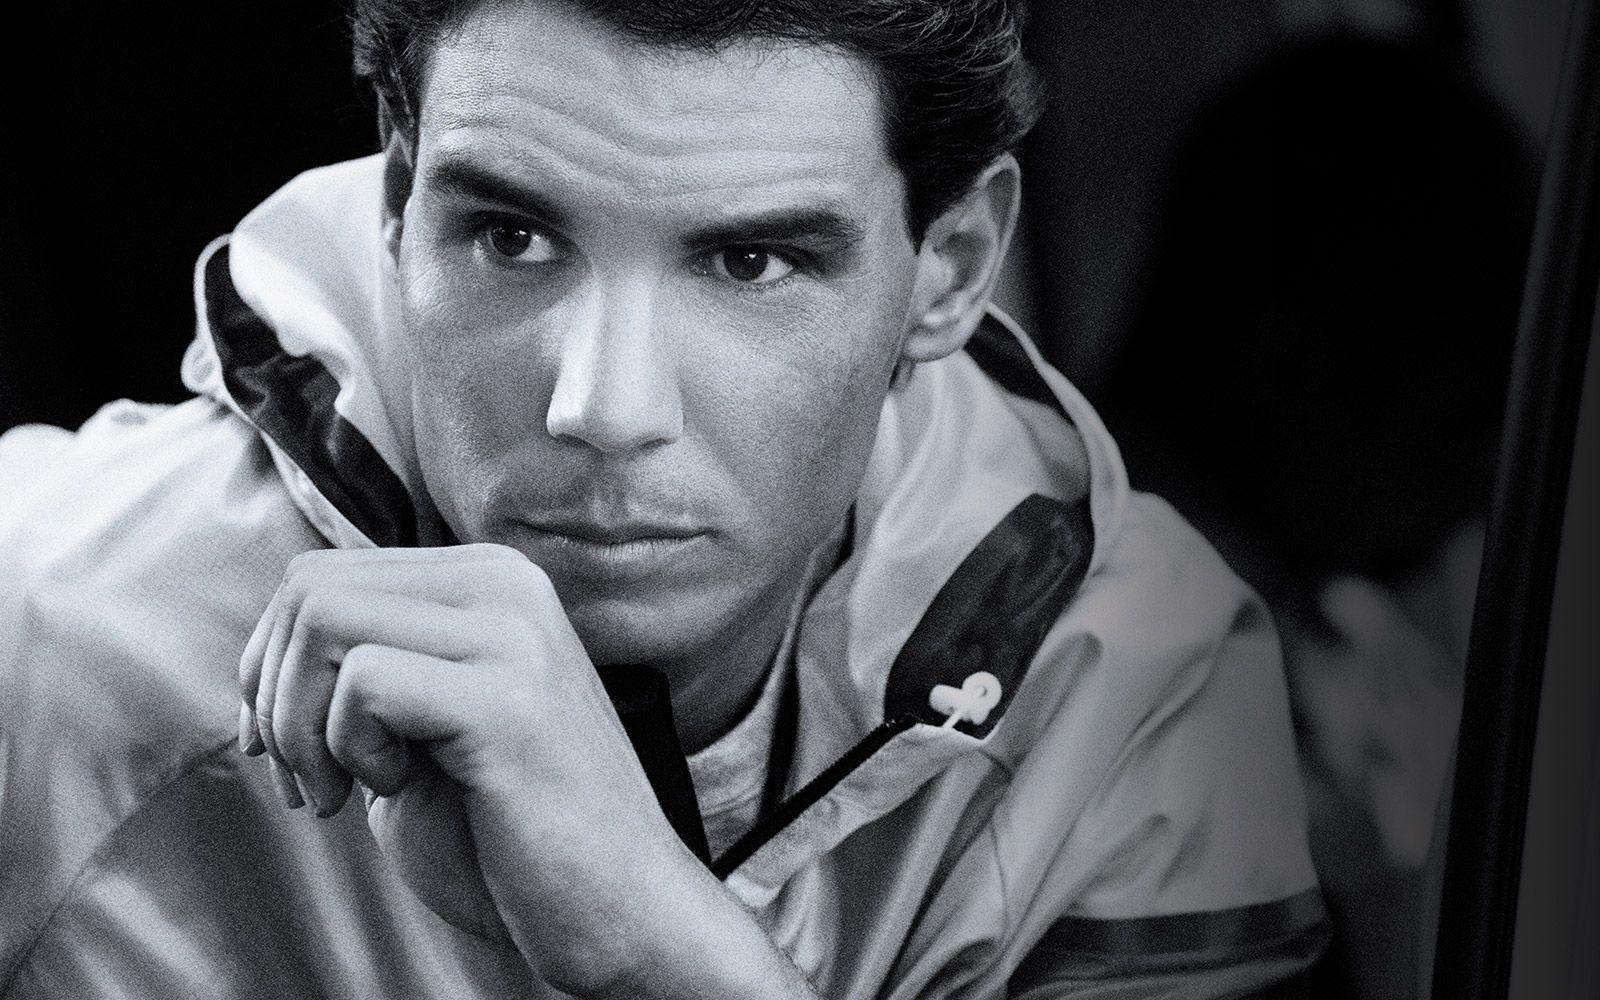 Photos Rafael Nadal Models For New Nike Tech Pack Campaign Rafael Nadal Fans